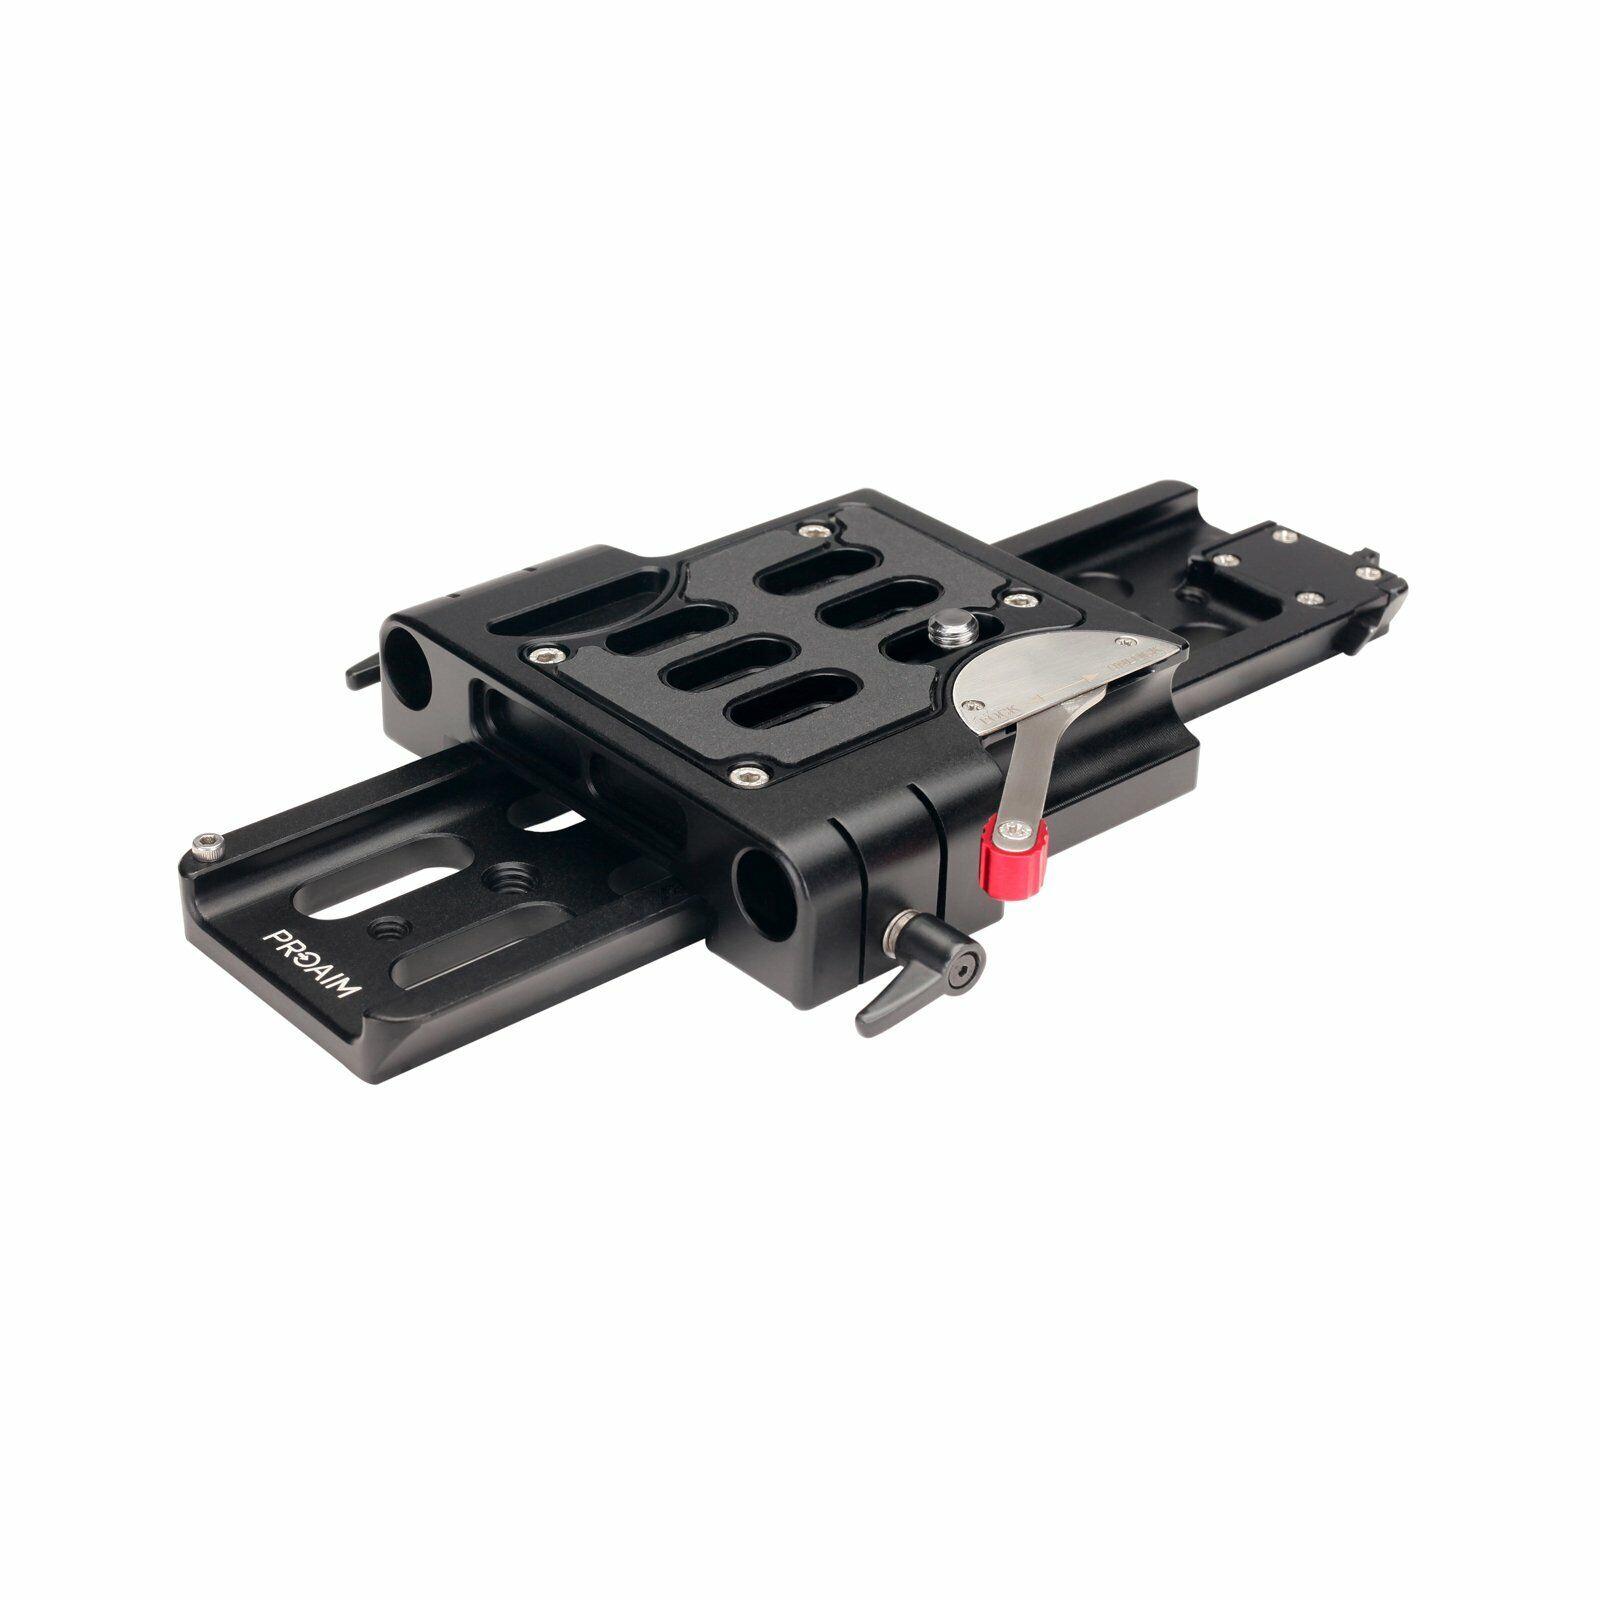 Proaim15mmQuick Release Camera Base Platewith Dovetail(ARRI Standard)(P-BPDP-15)